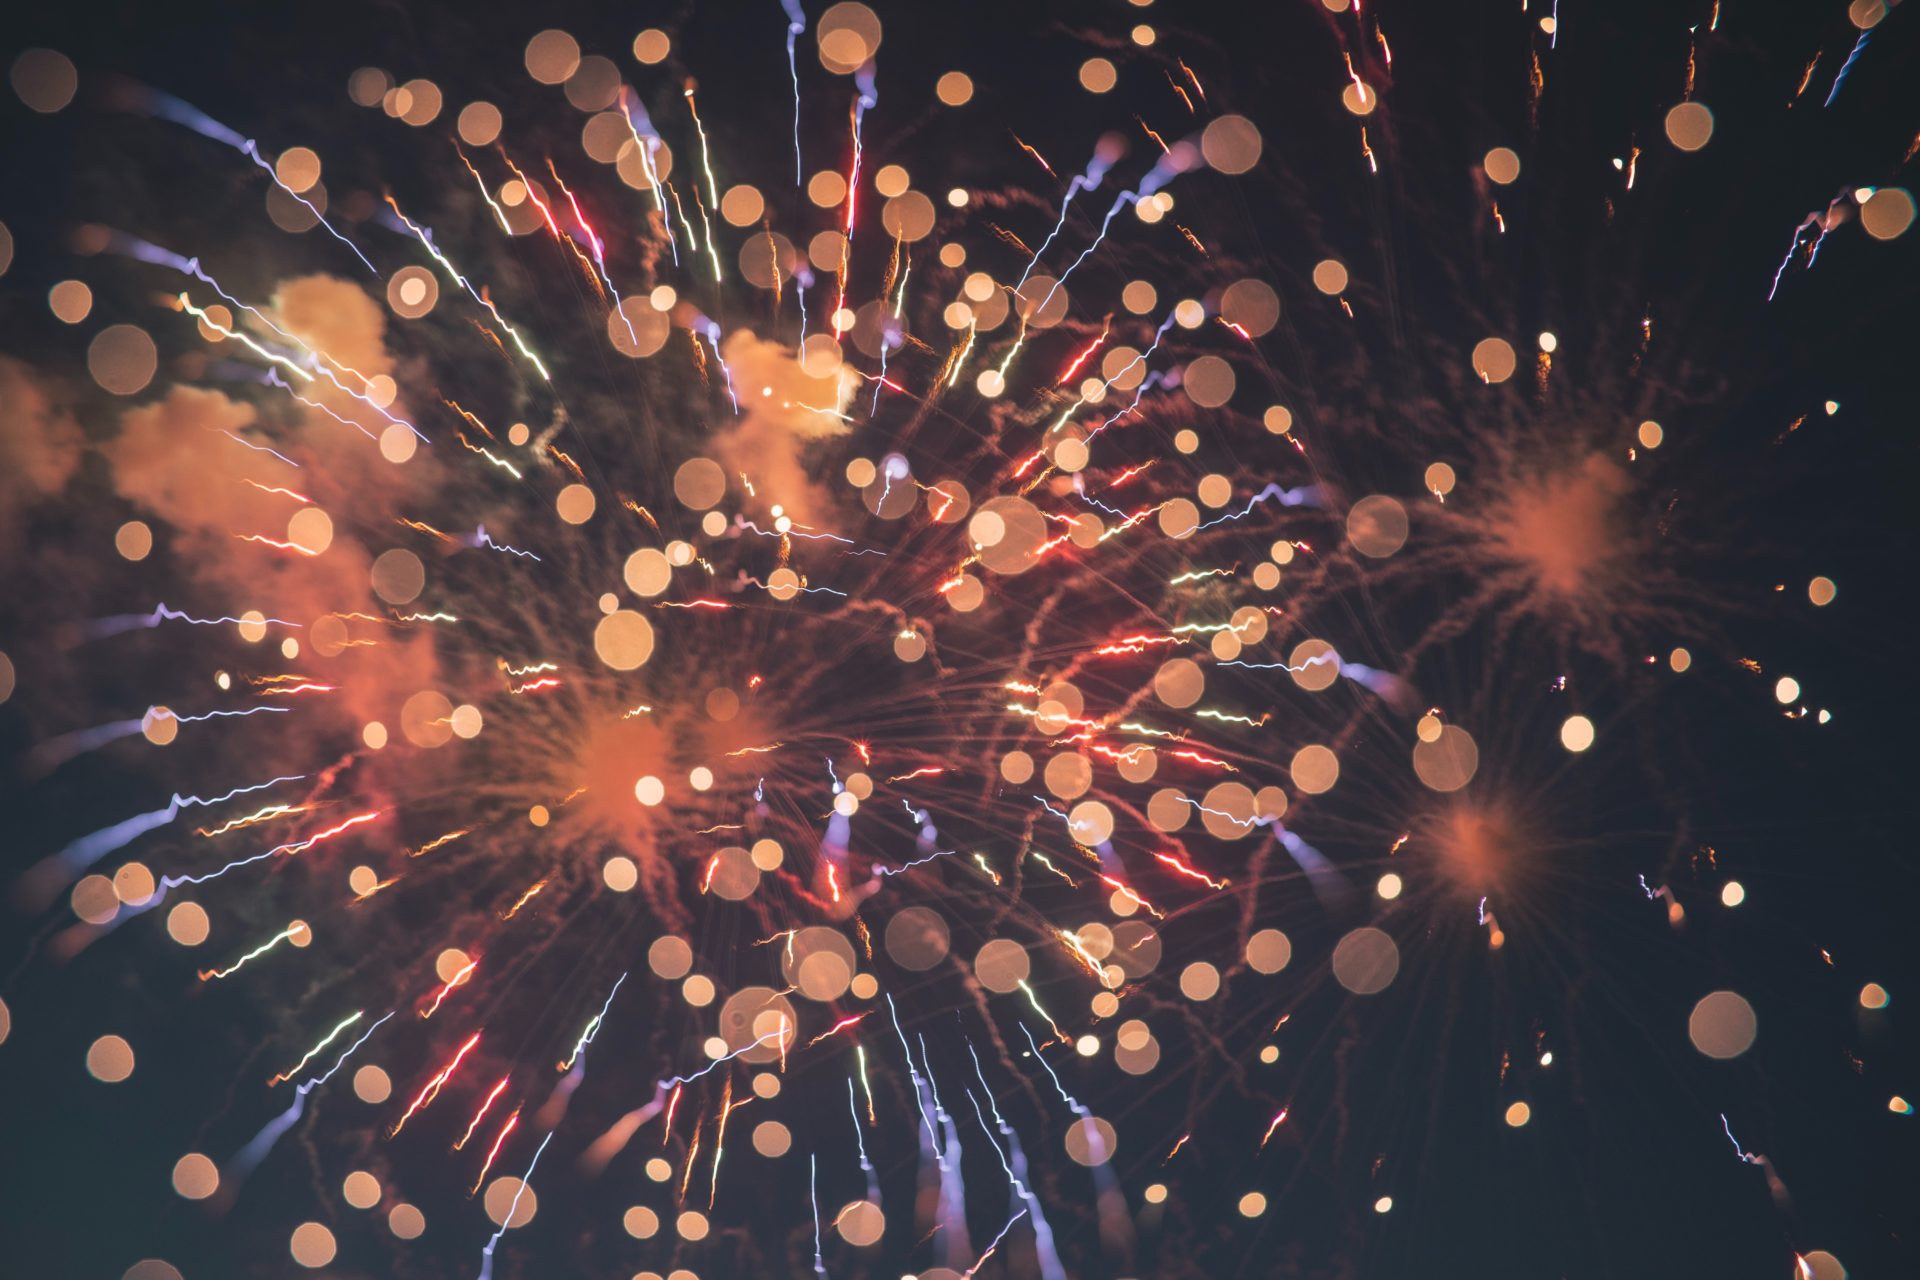 orange-and purple-fireworks